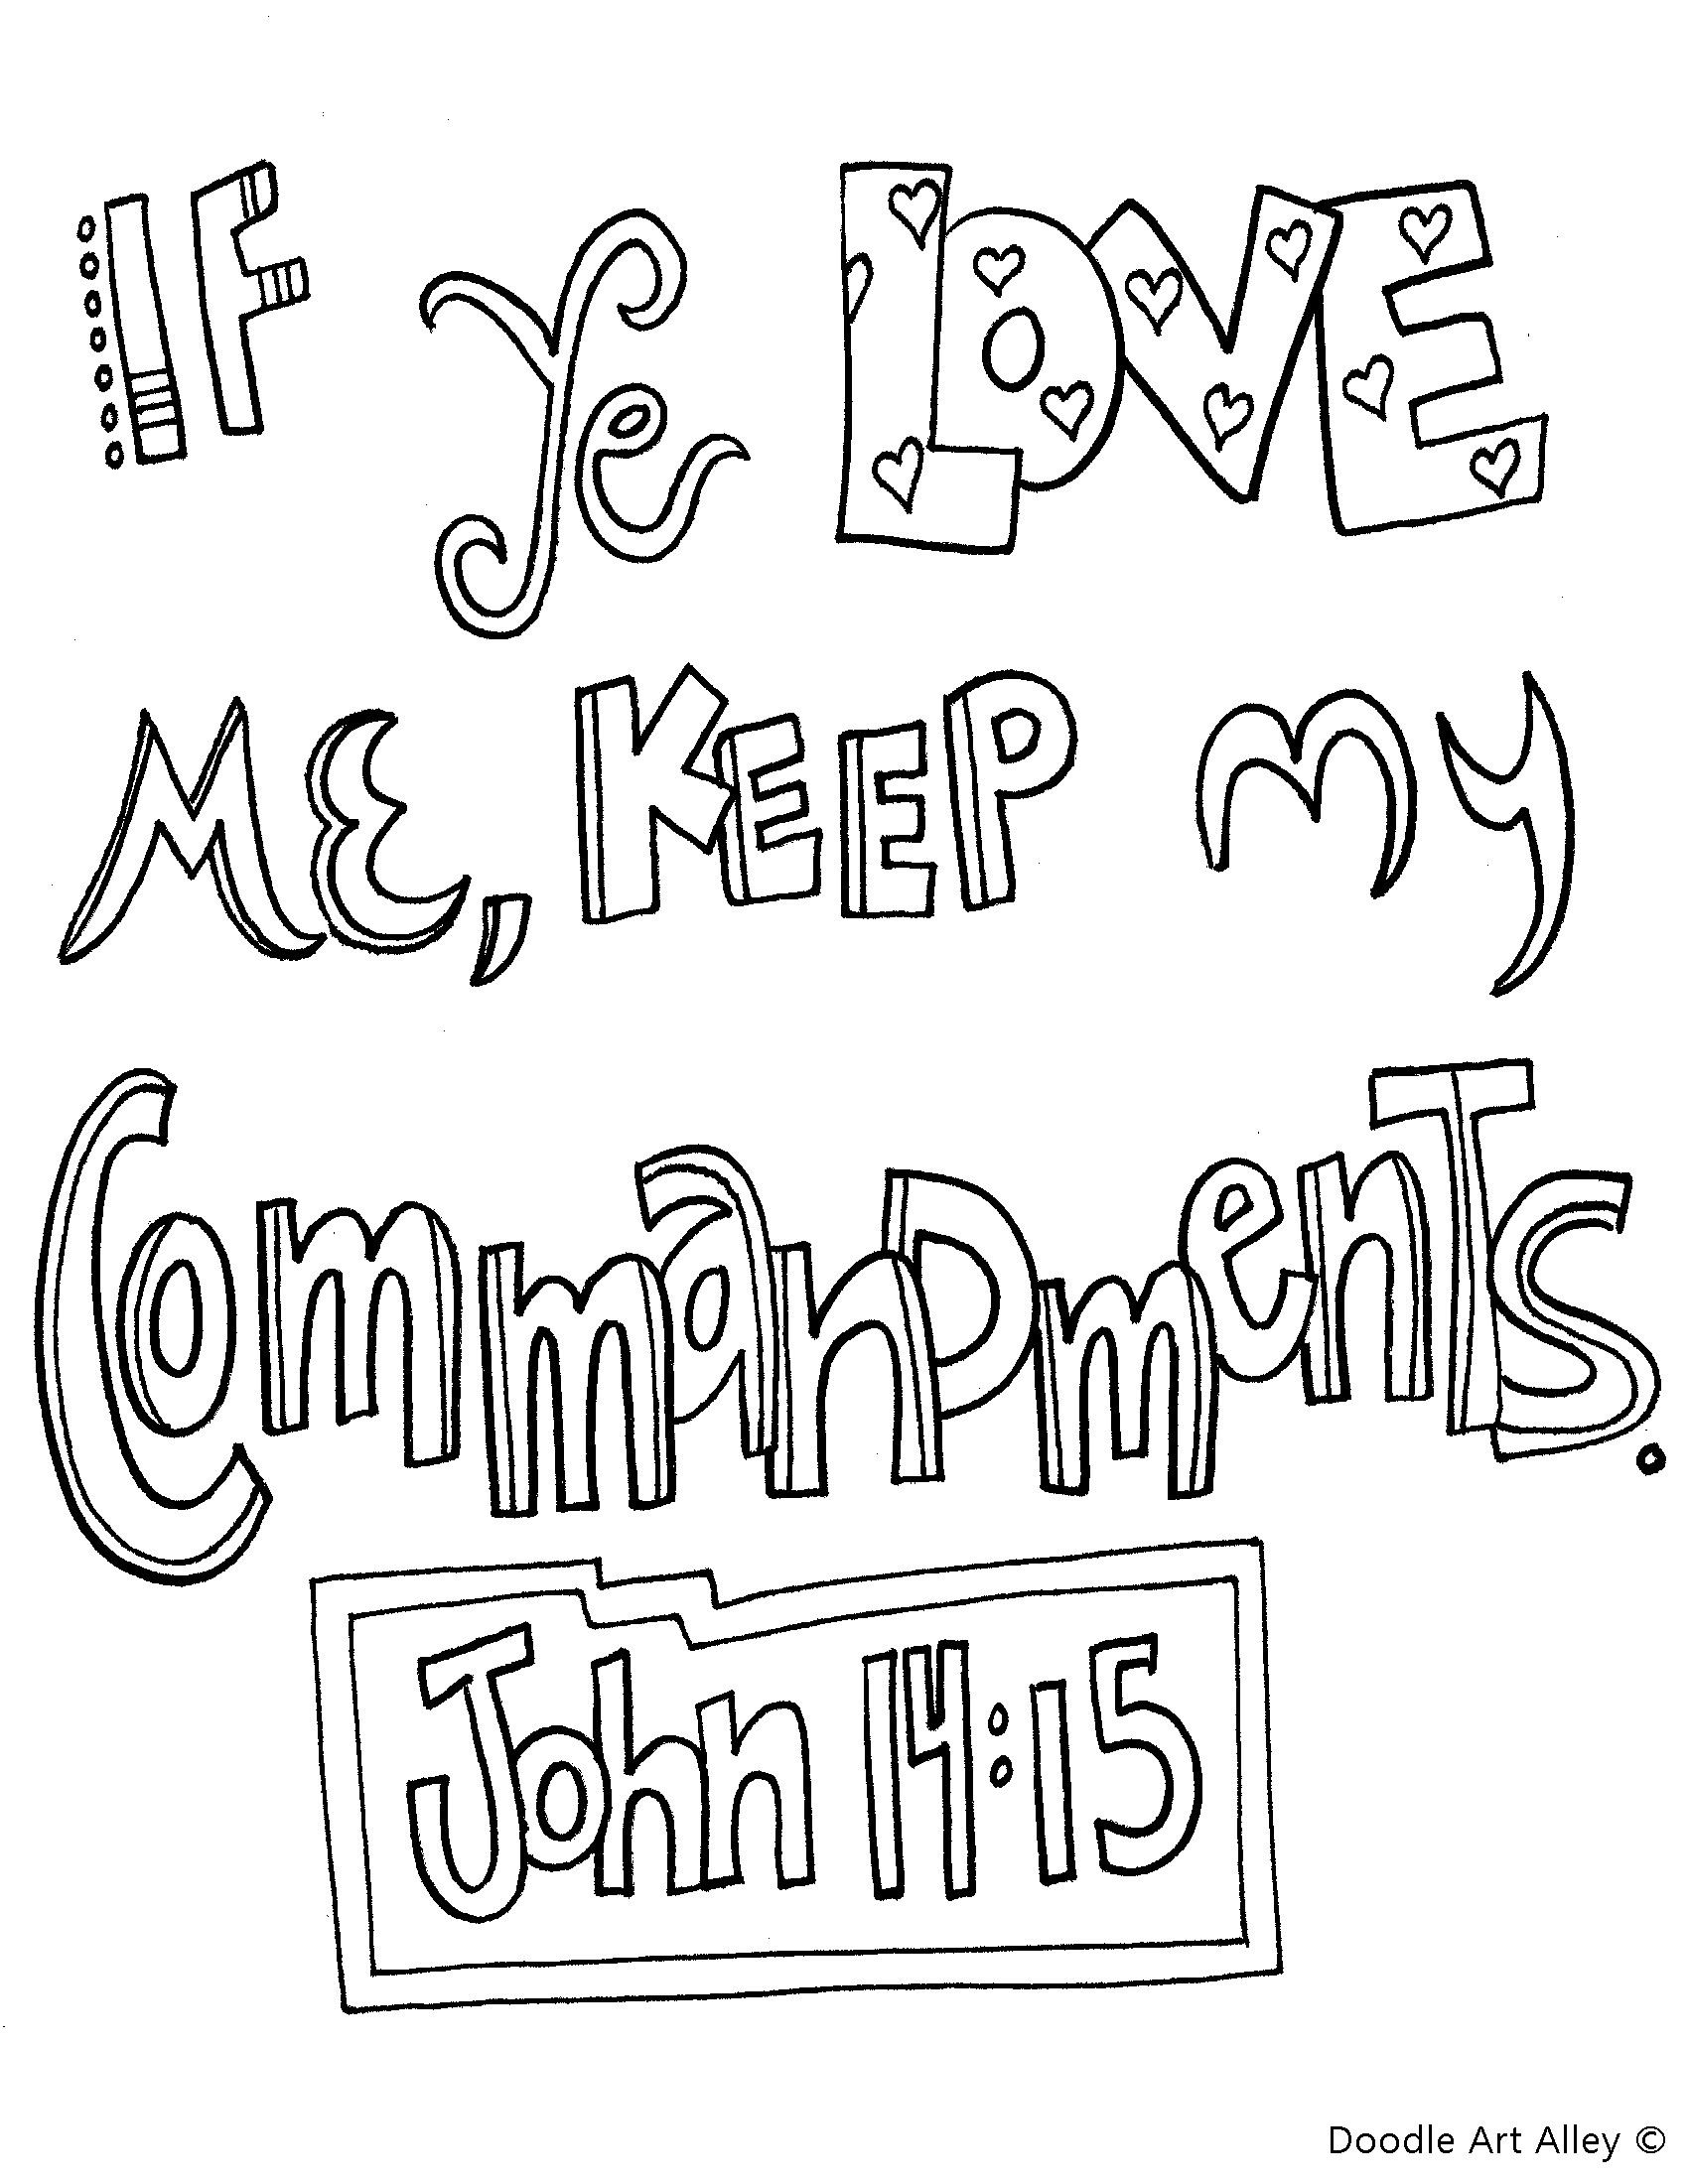 John 14 15 If You Love Me Keep My Commandments Bible Verse